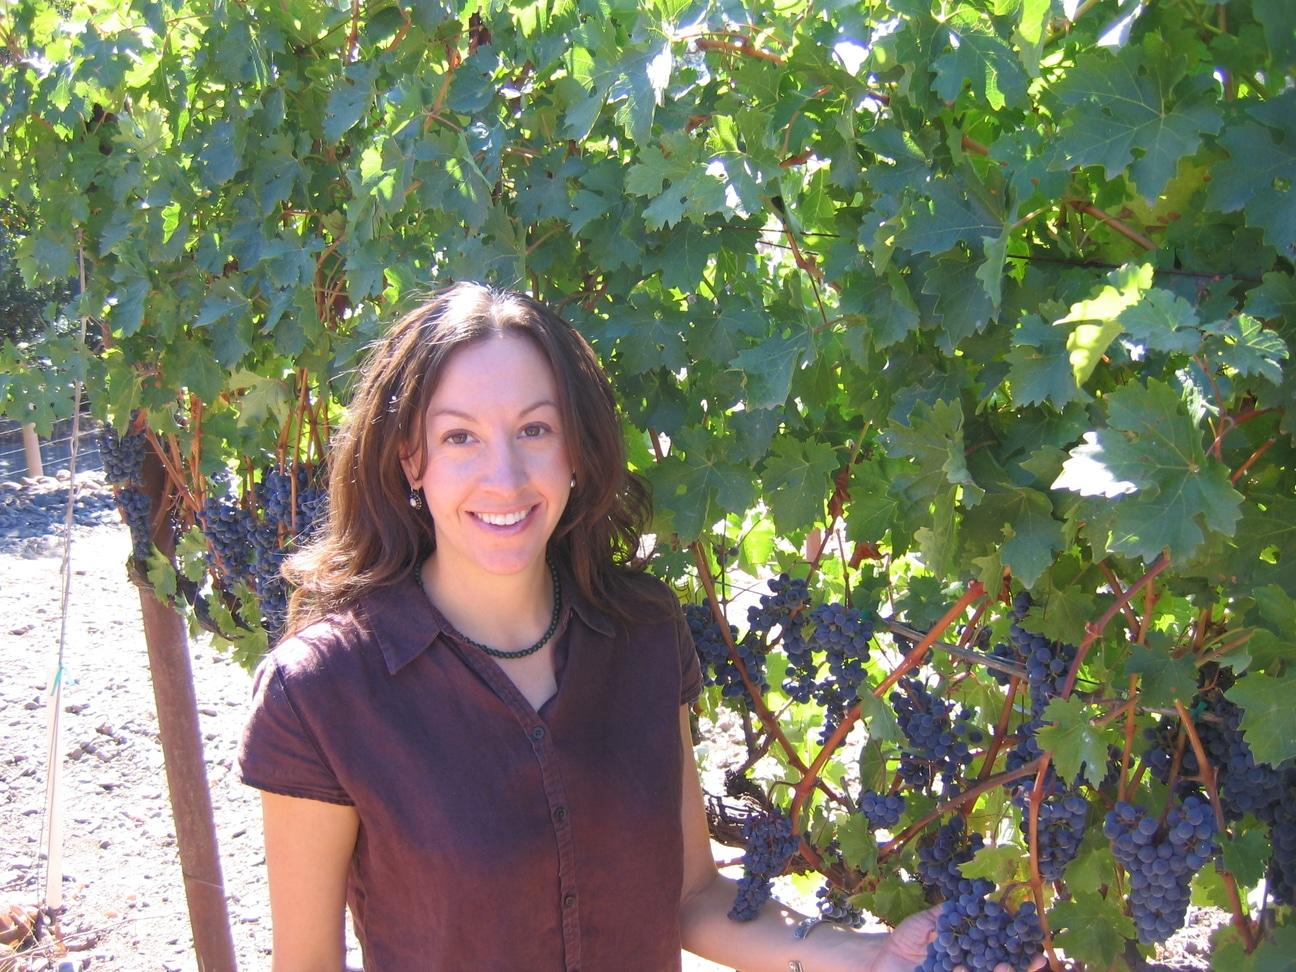 winemaker resume samples